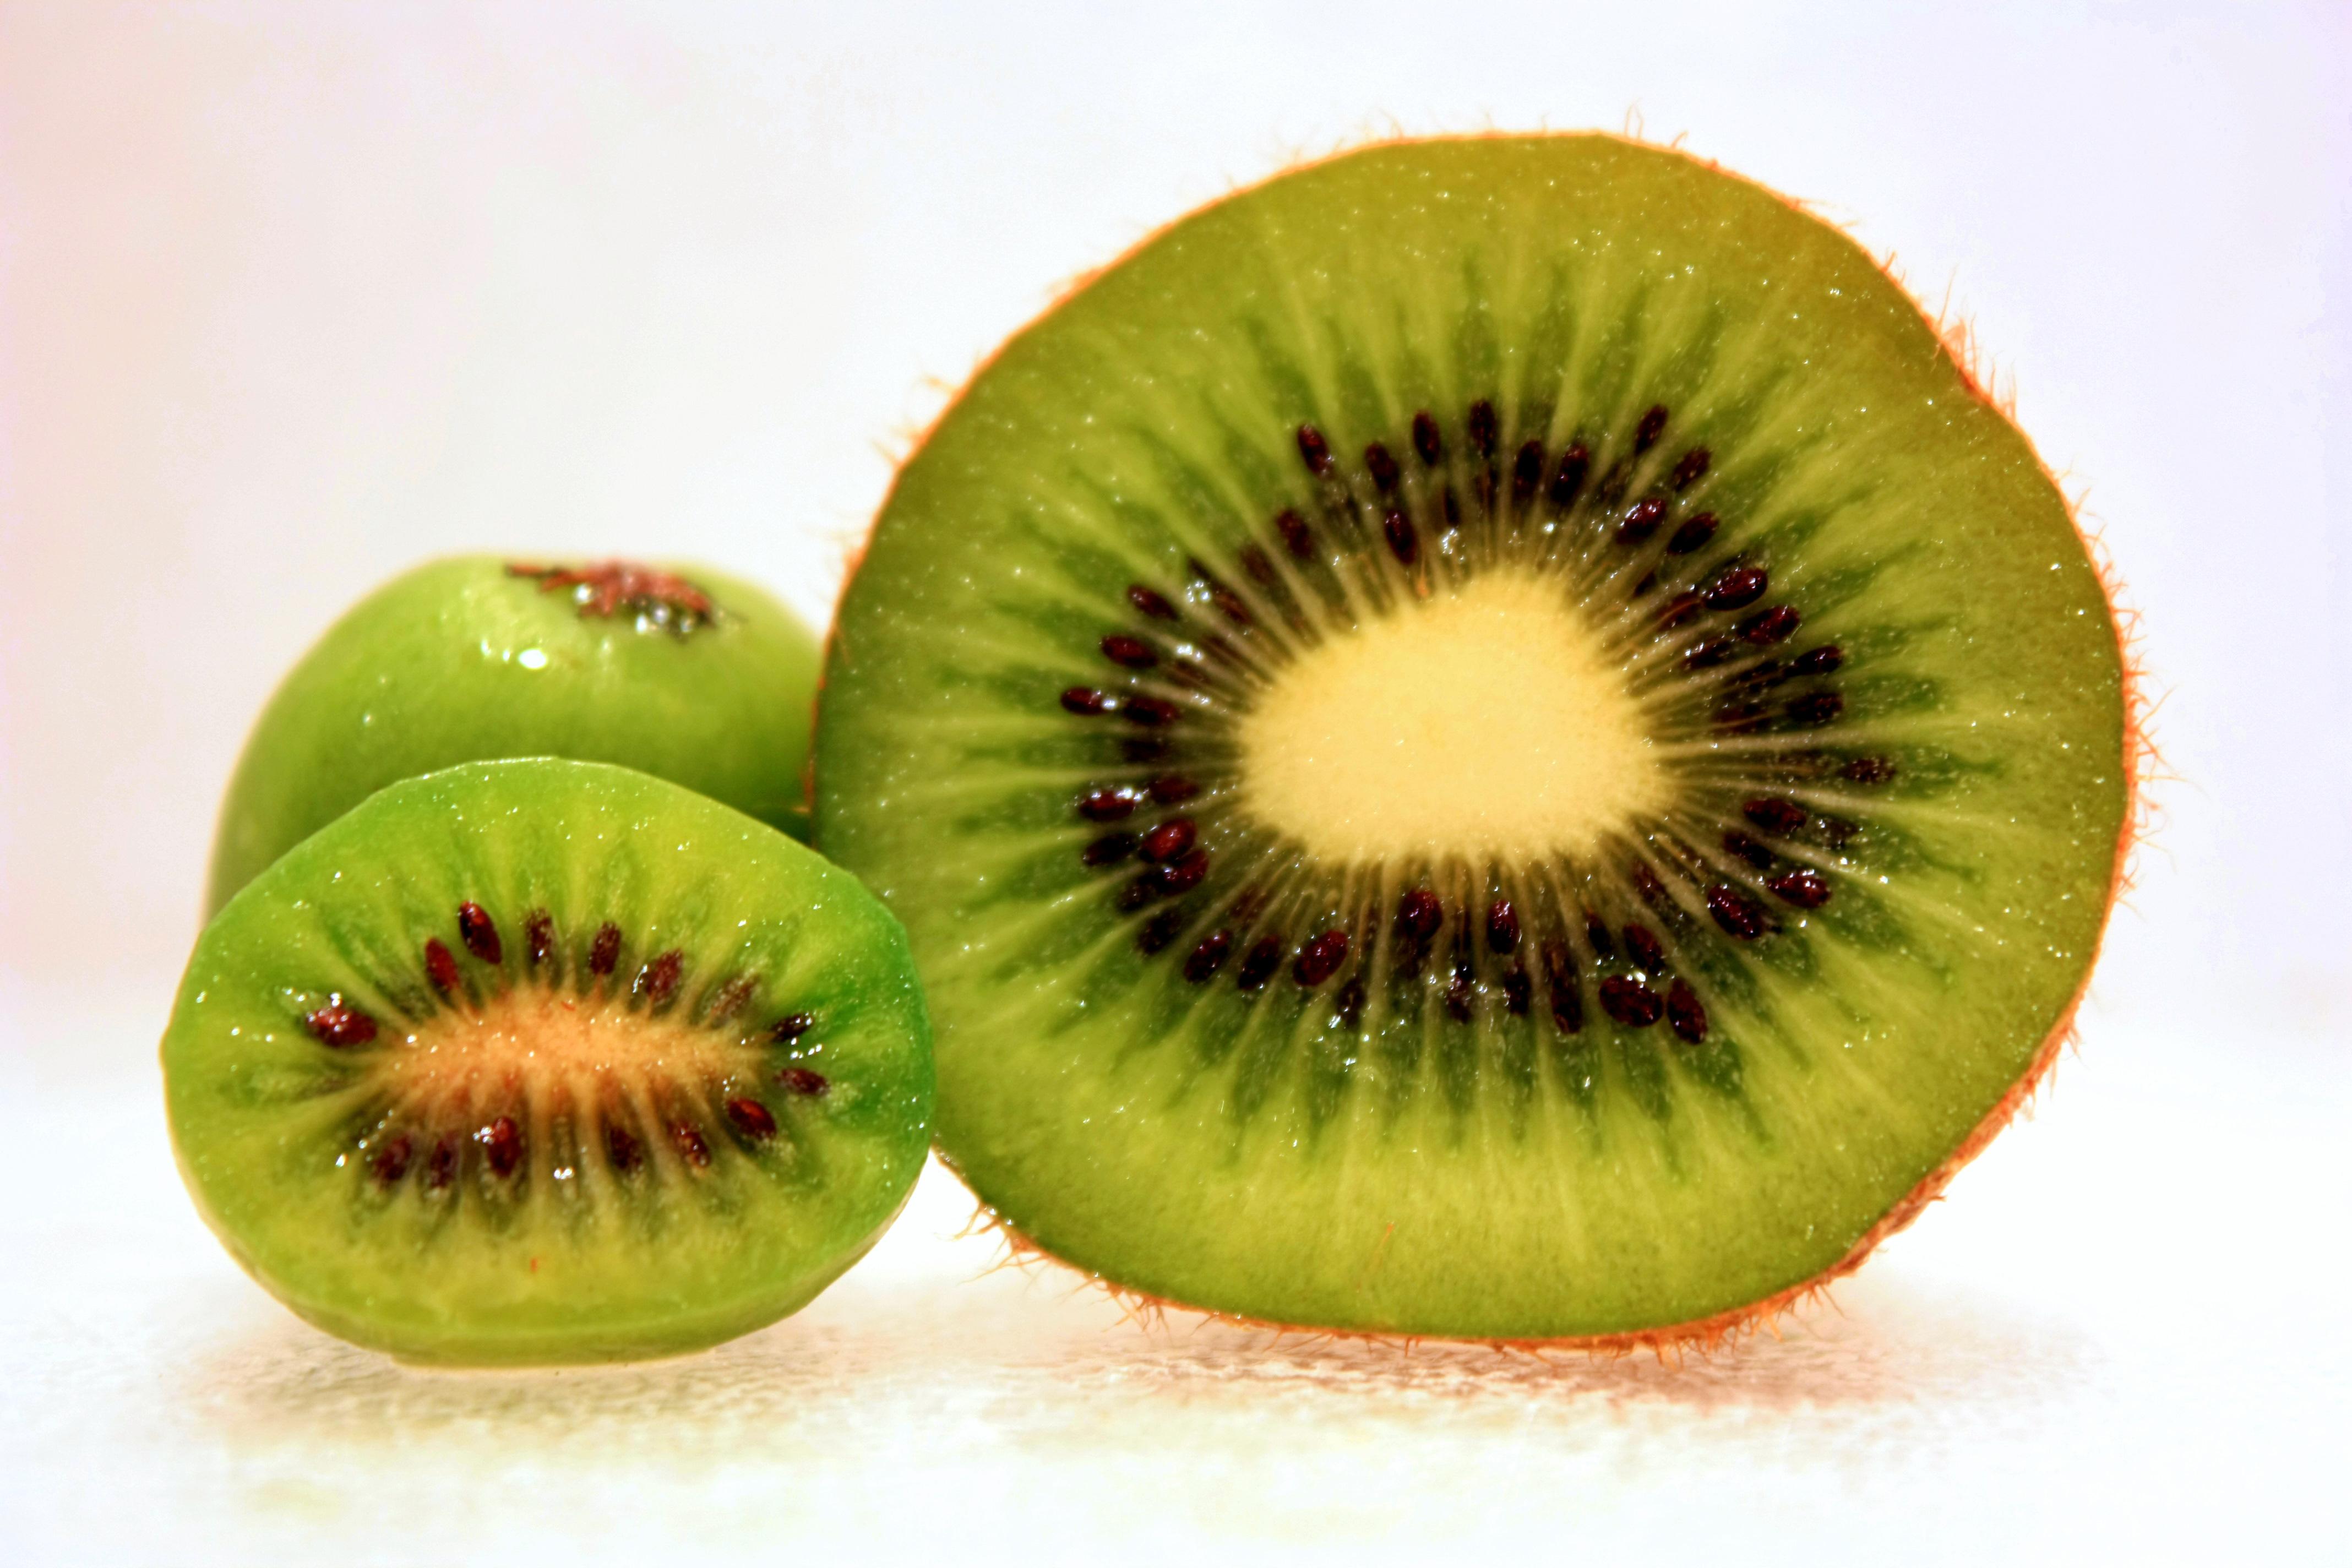 File:Hardy-Kiwi-Comparison-2.jpg - Wikipedia